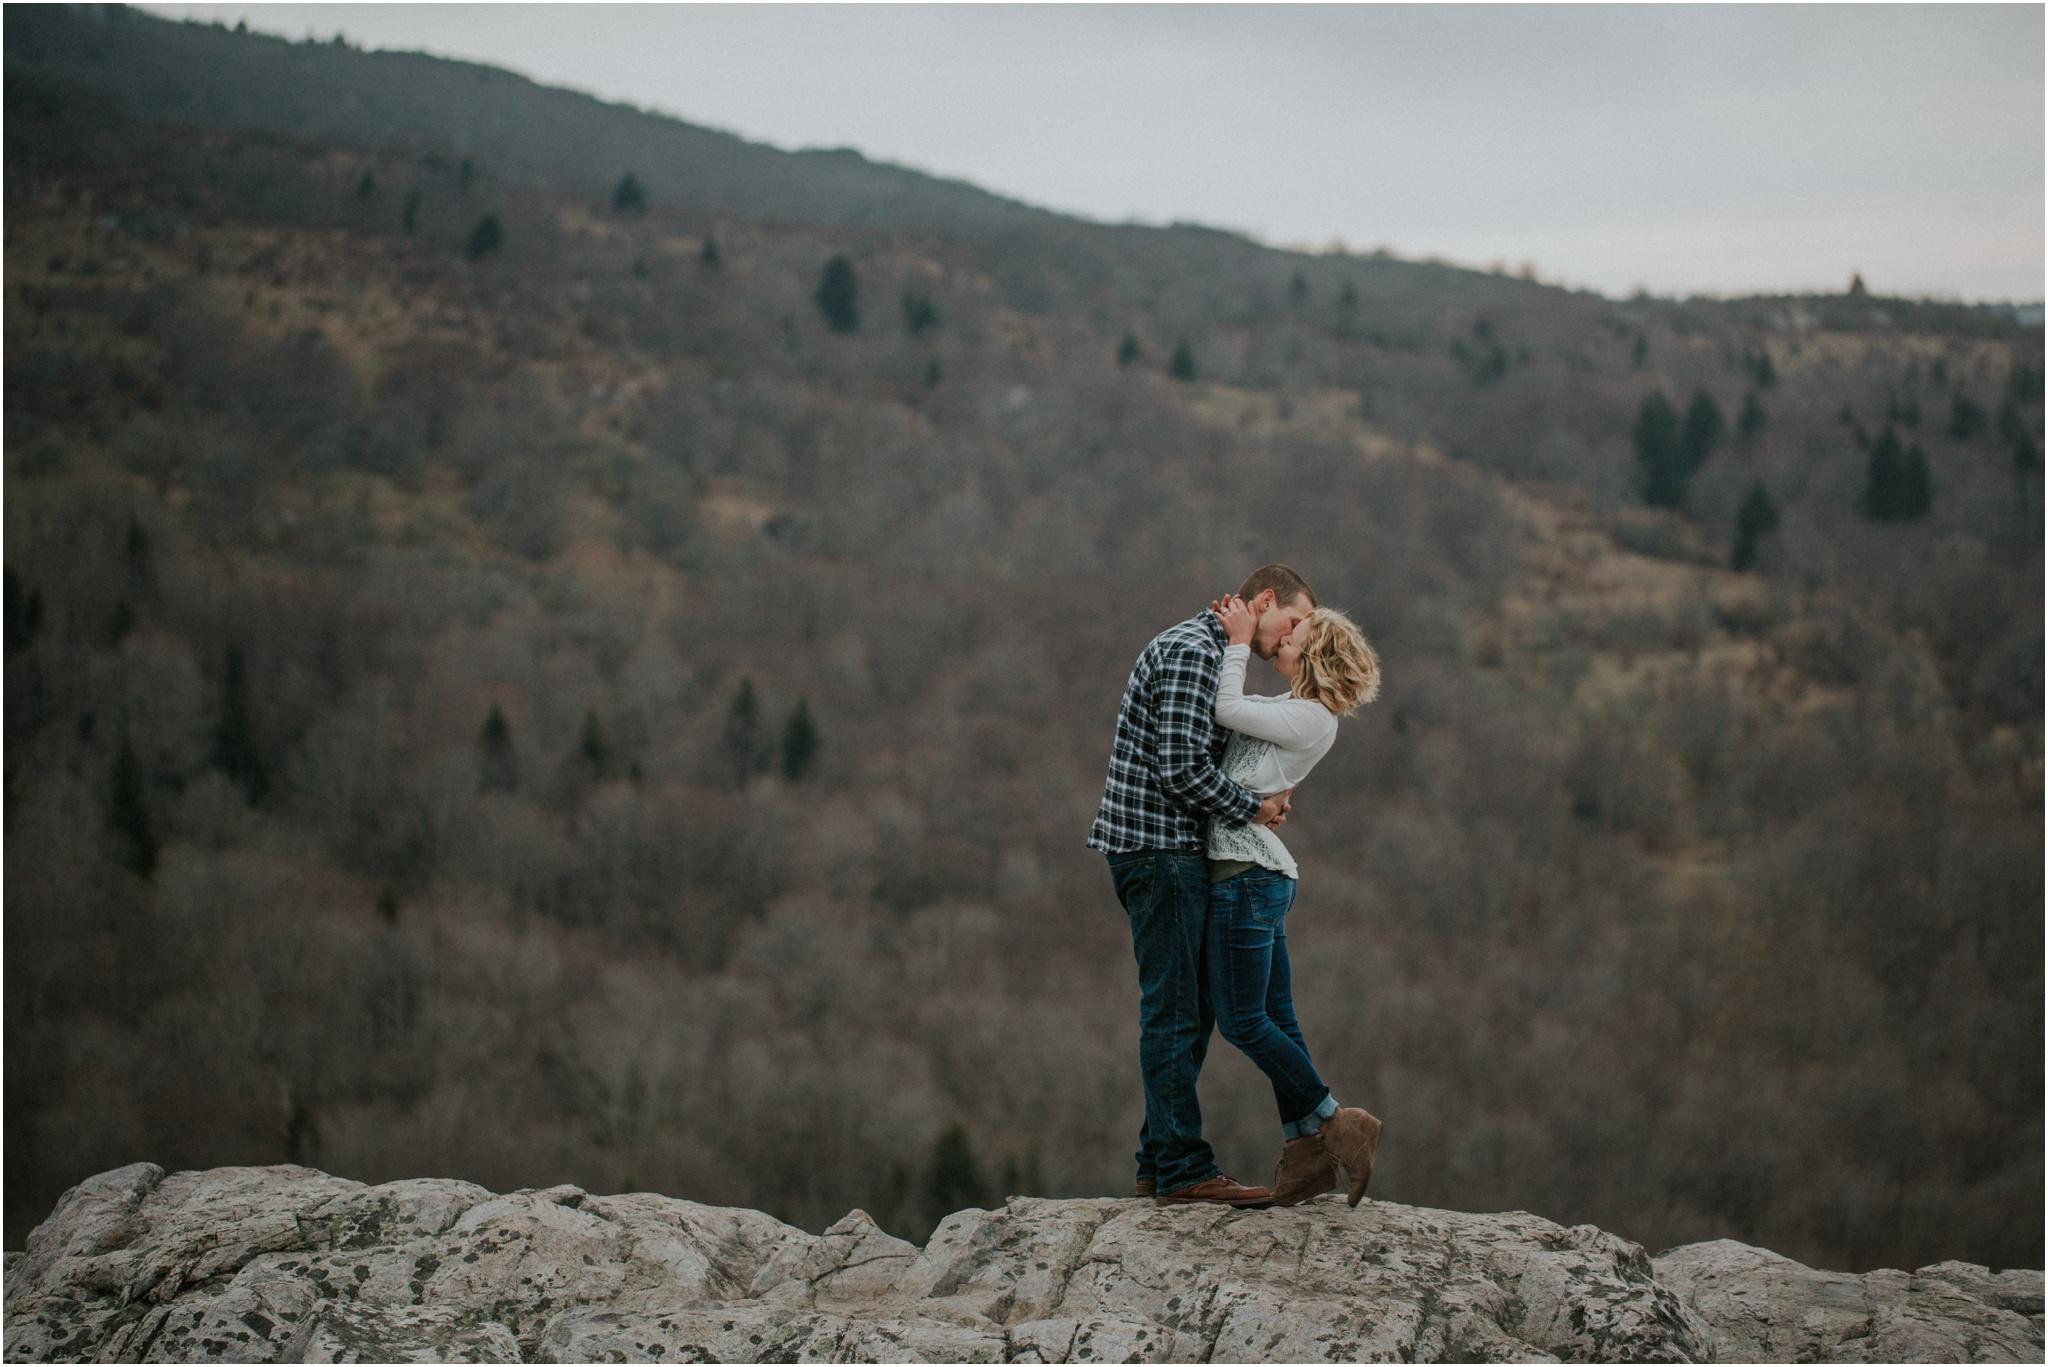 grayson-highlands-engagement-session-foggy-mountain-rustic-appalachian-virginia-katy-sergent-photography_0030.jpg